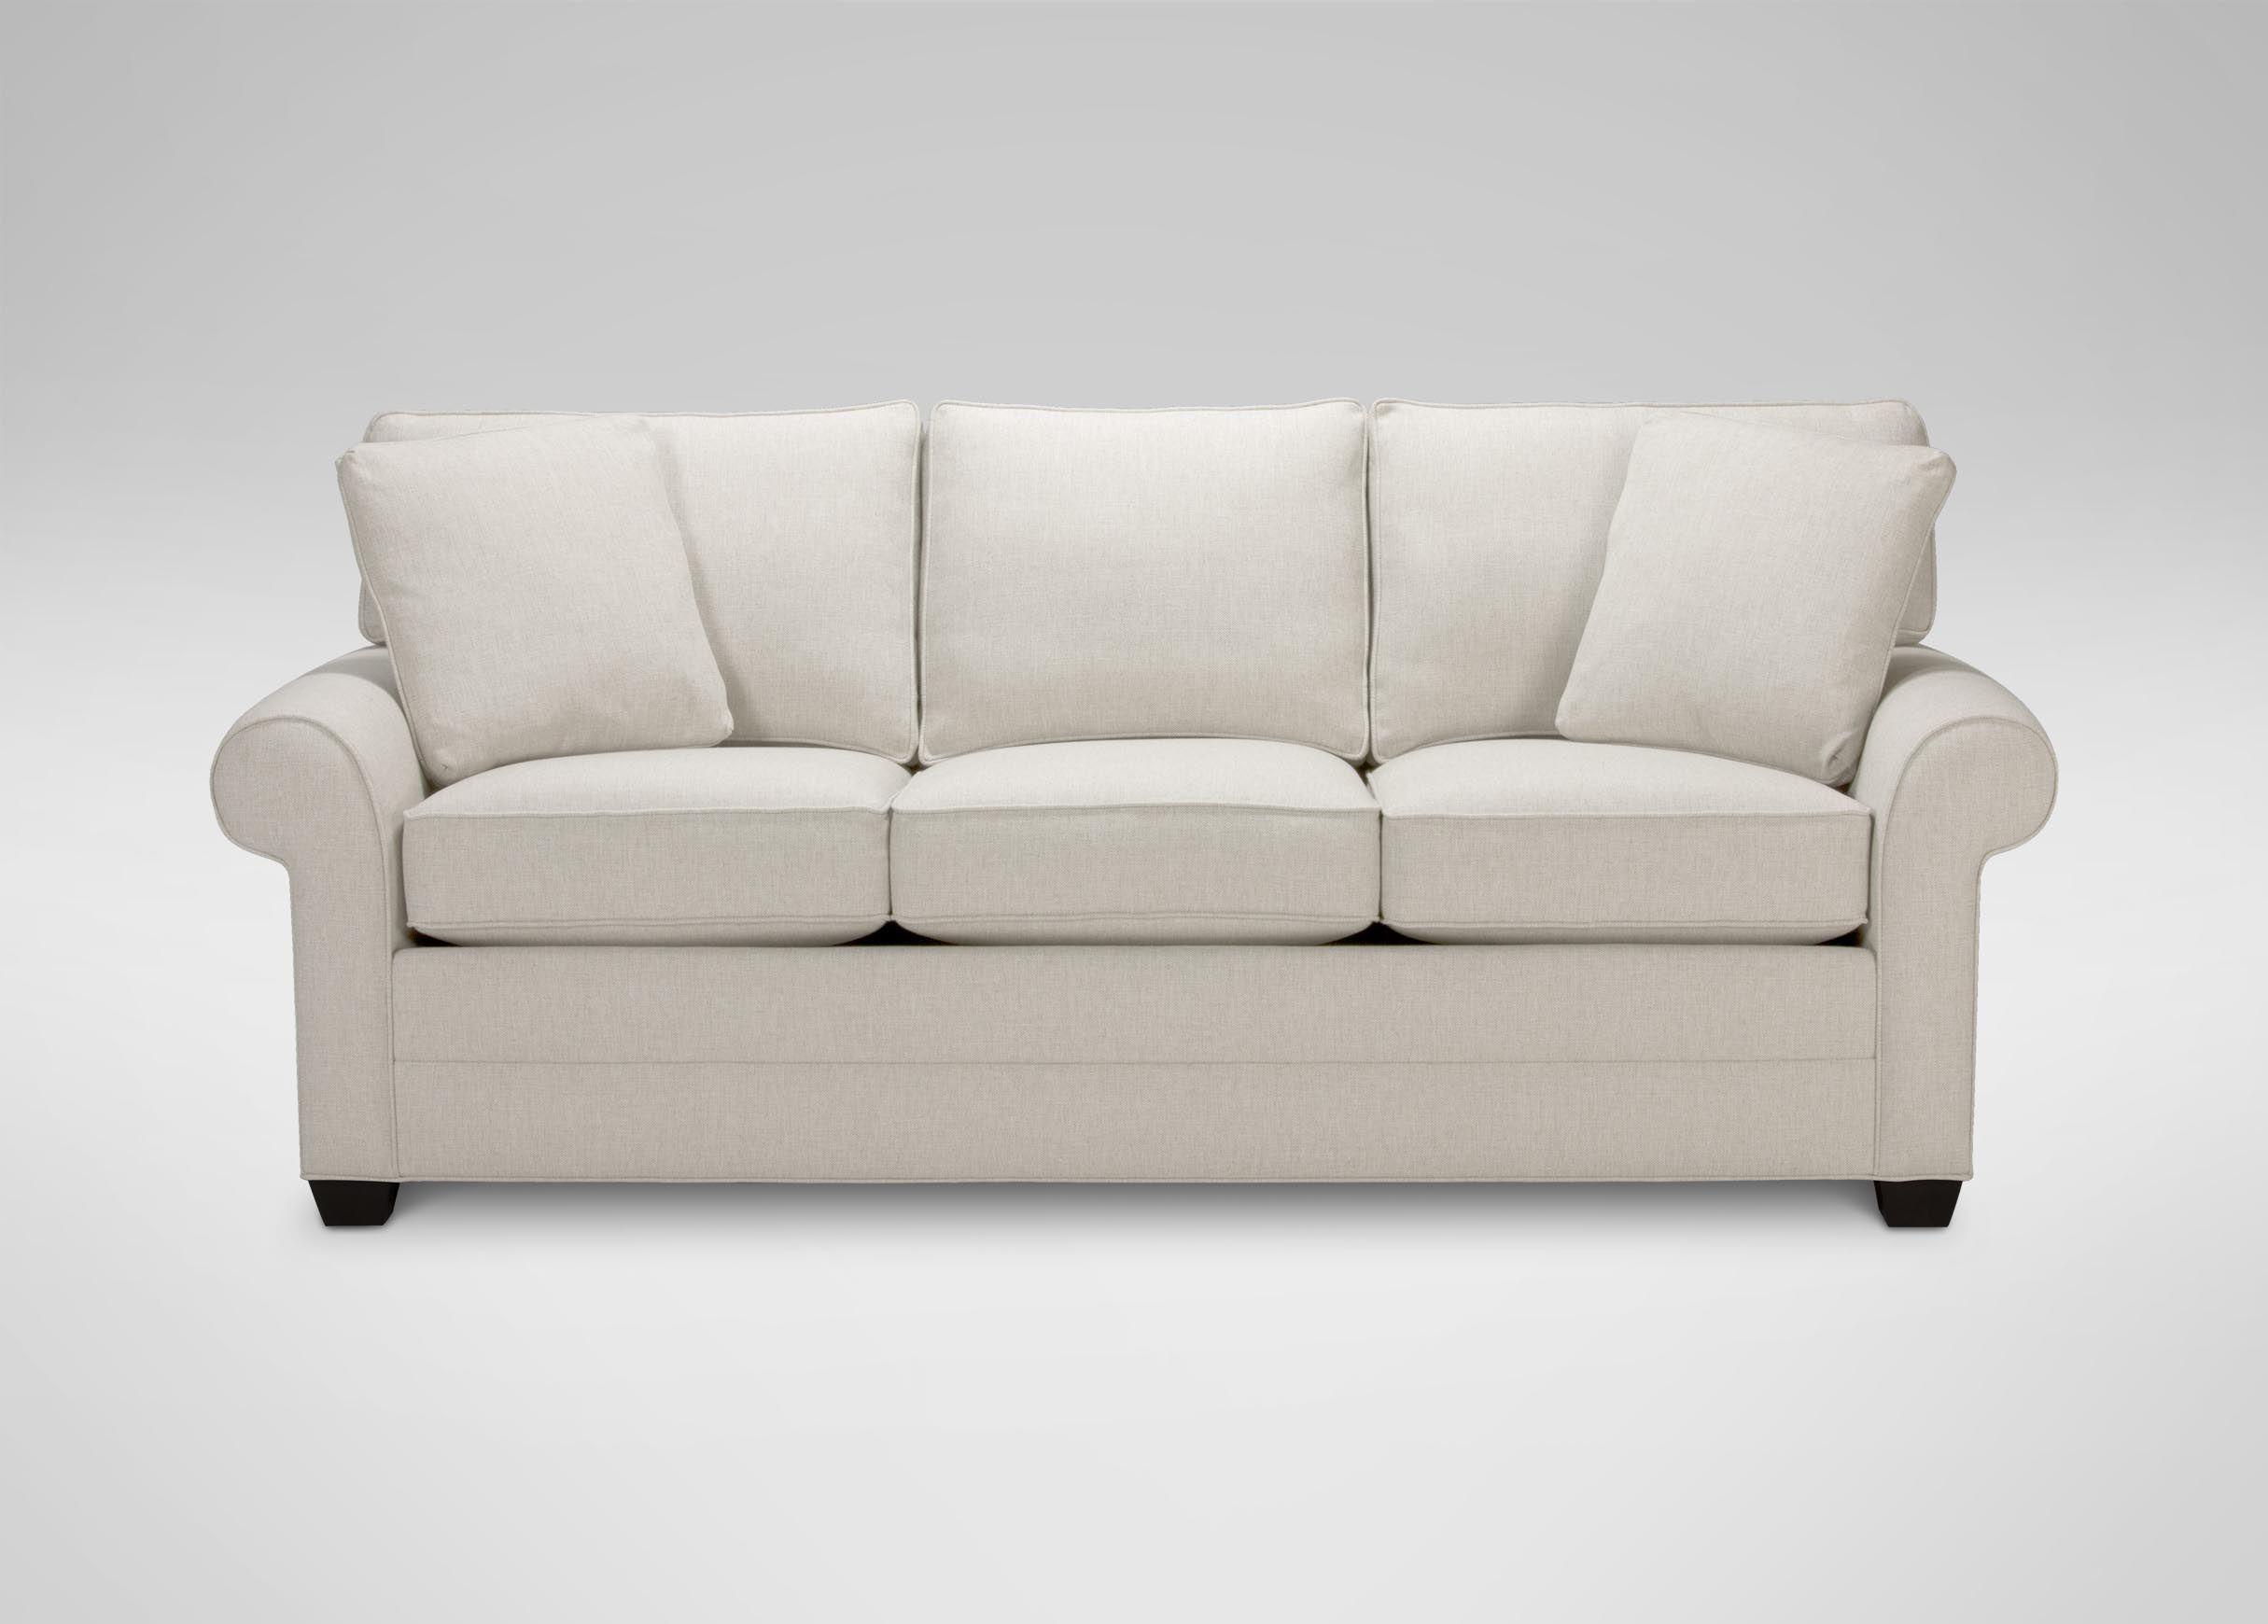 Bennett Roll Arm Sofa Quick Ship Sofas & Loveseats